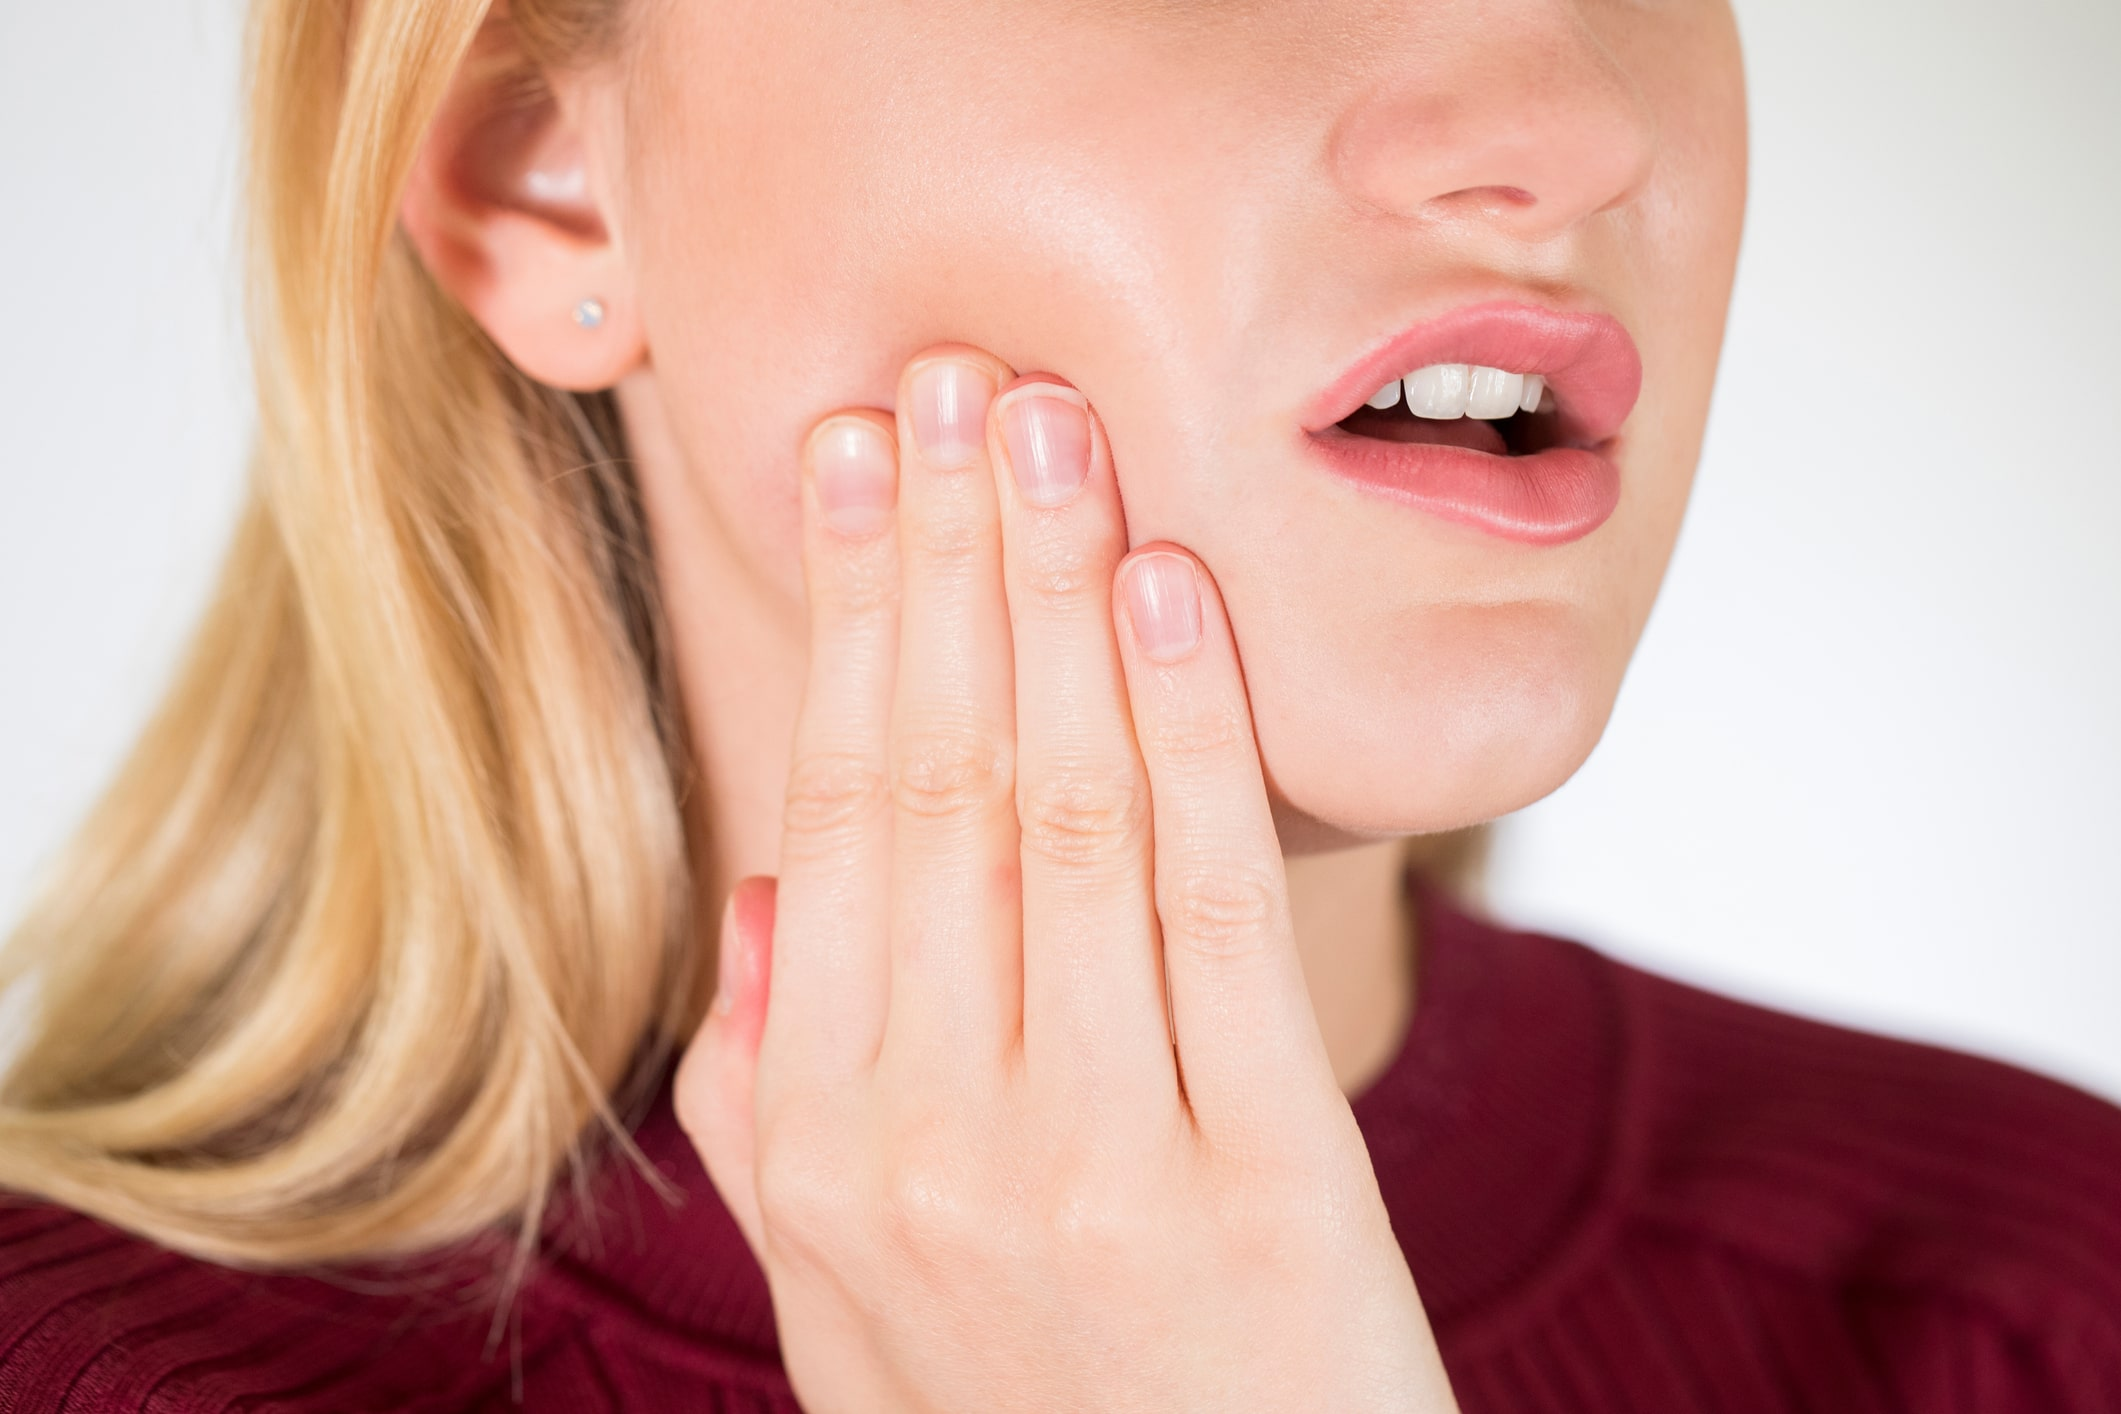 Jaw Exercises Warm Compresses Beneficial For Temporomandibular